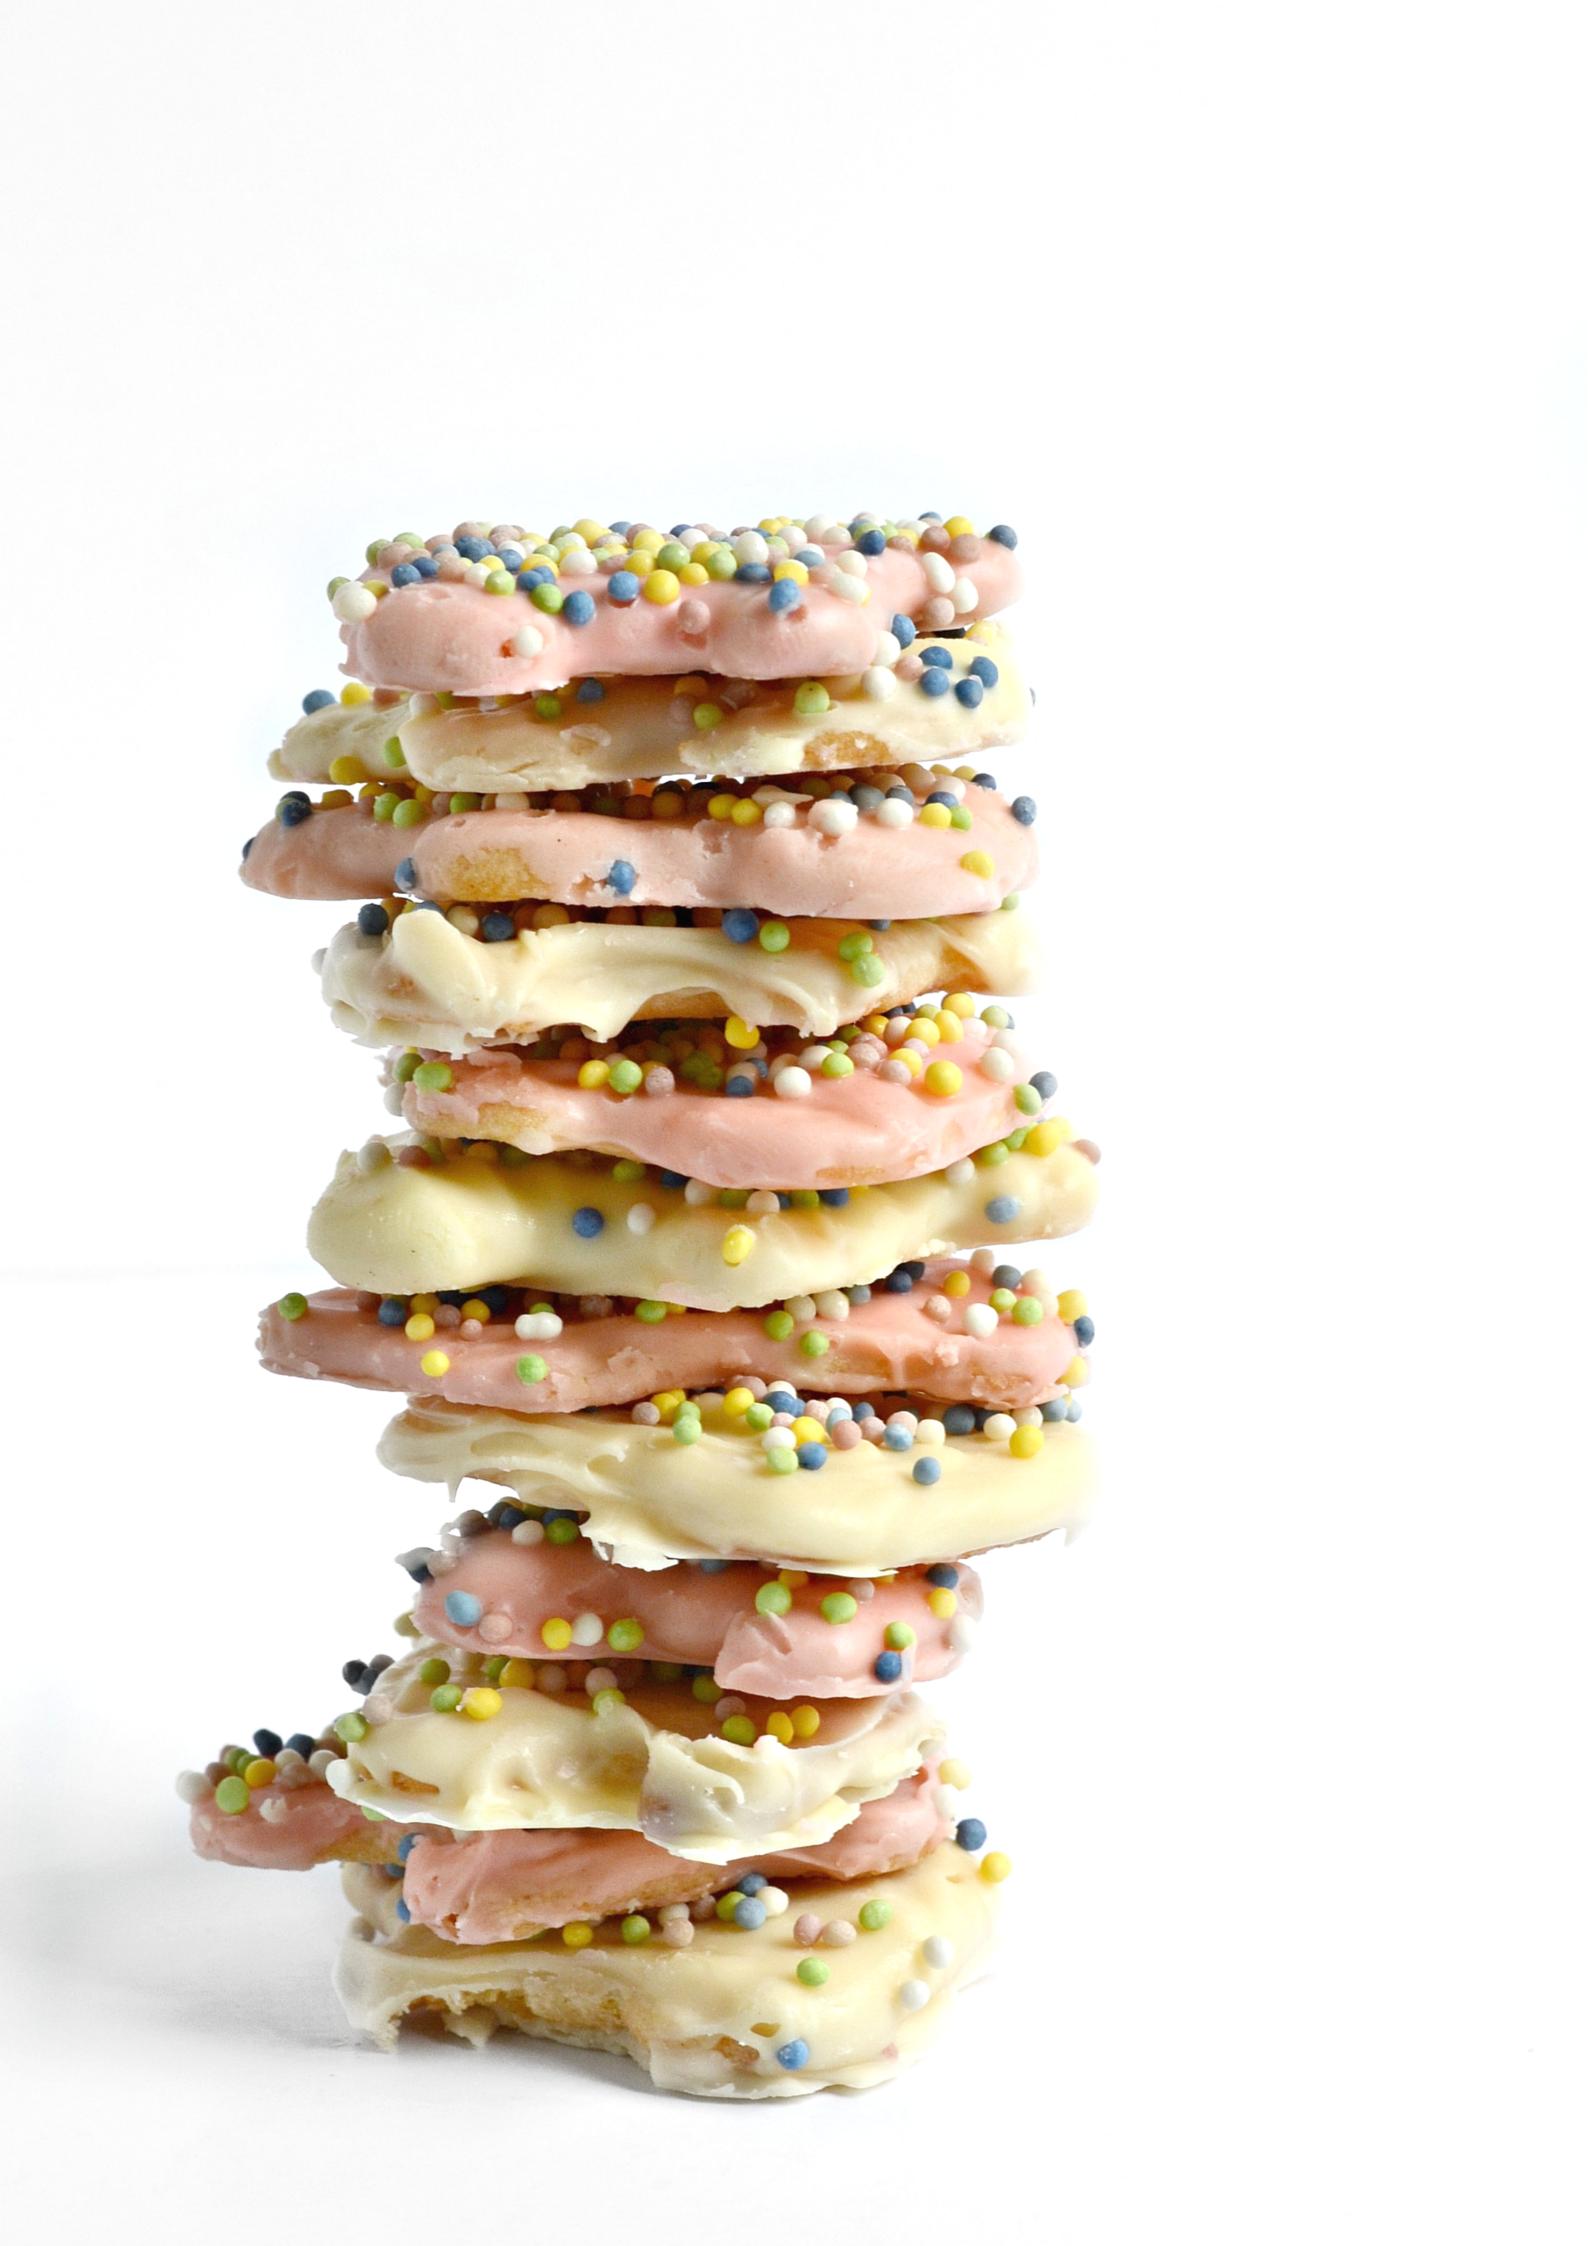 Homemade Circus Animal Cookies Recipe Treats, Peanut